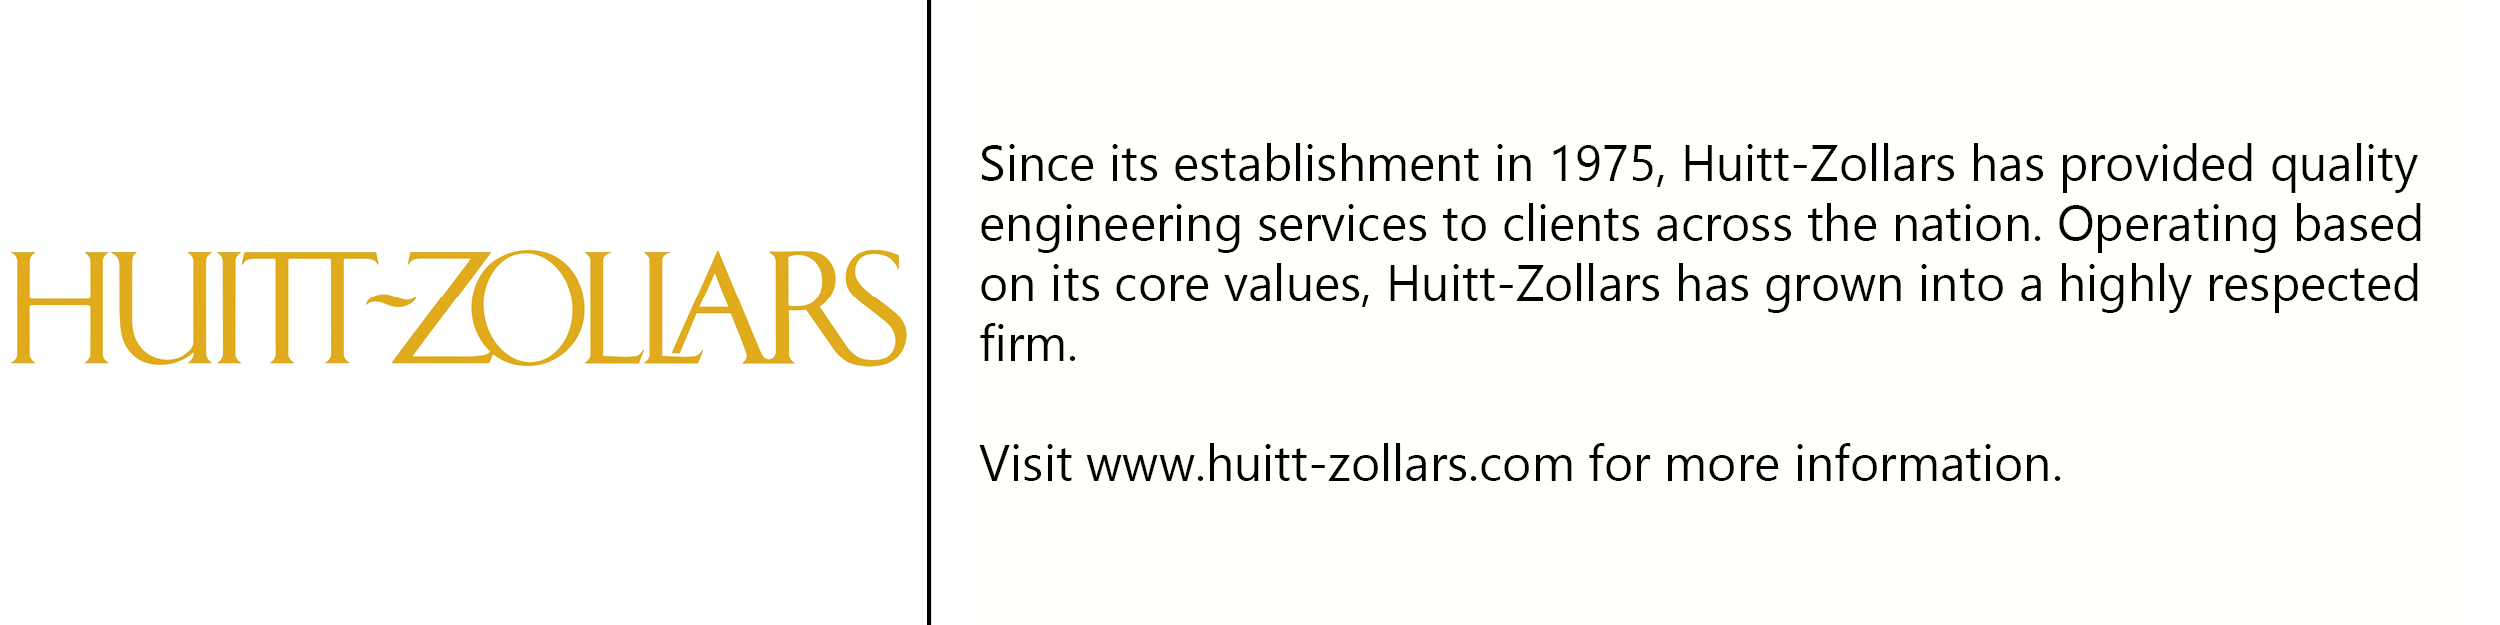 Huitt-Zollars logo with description of company